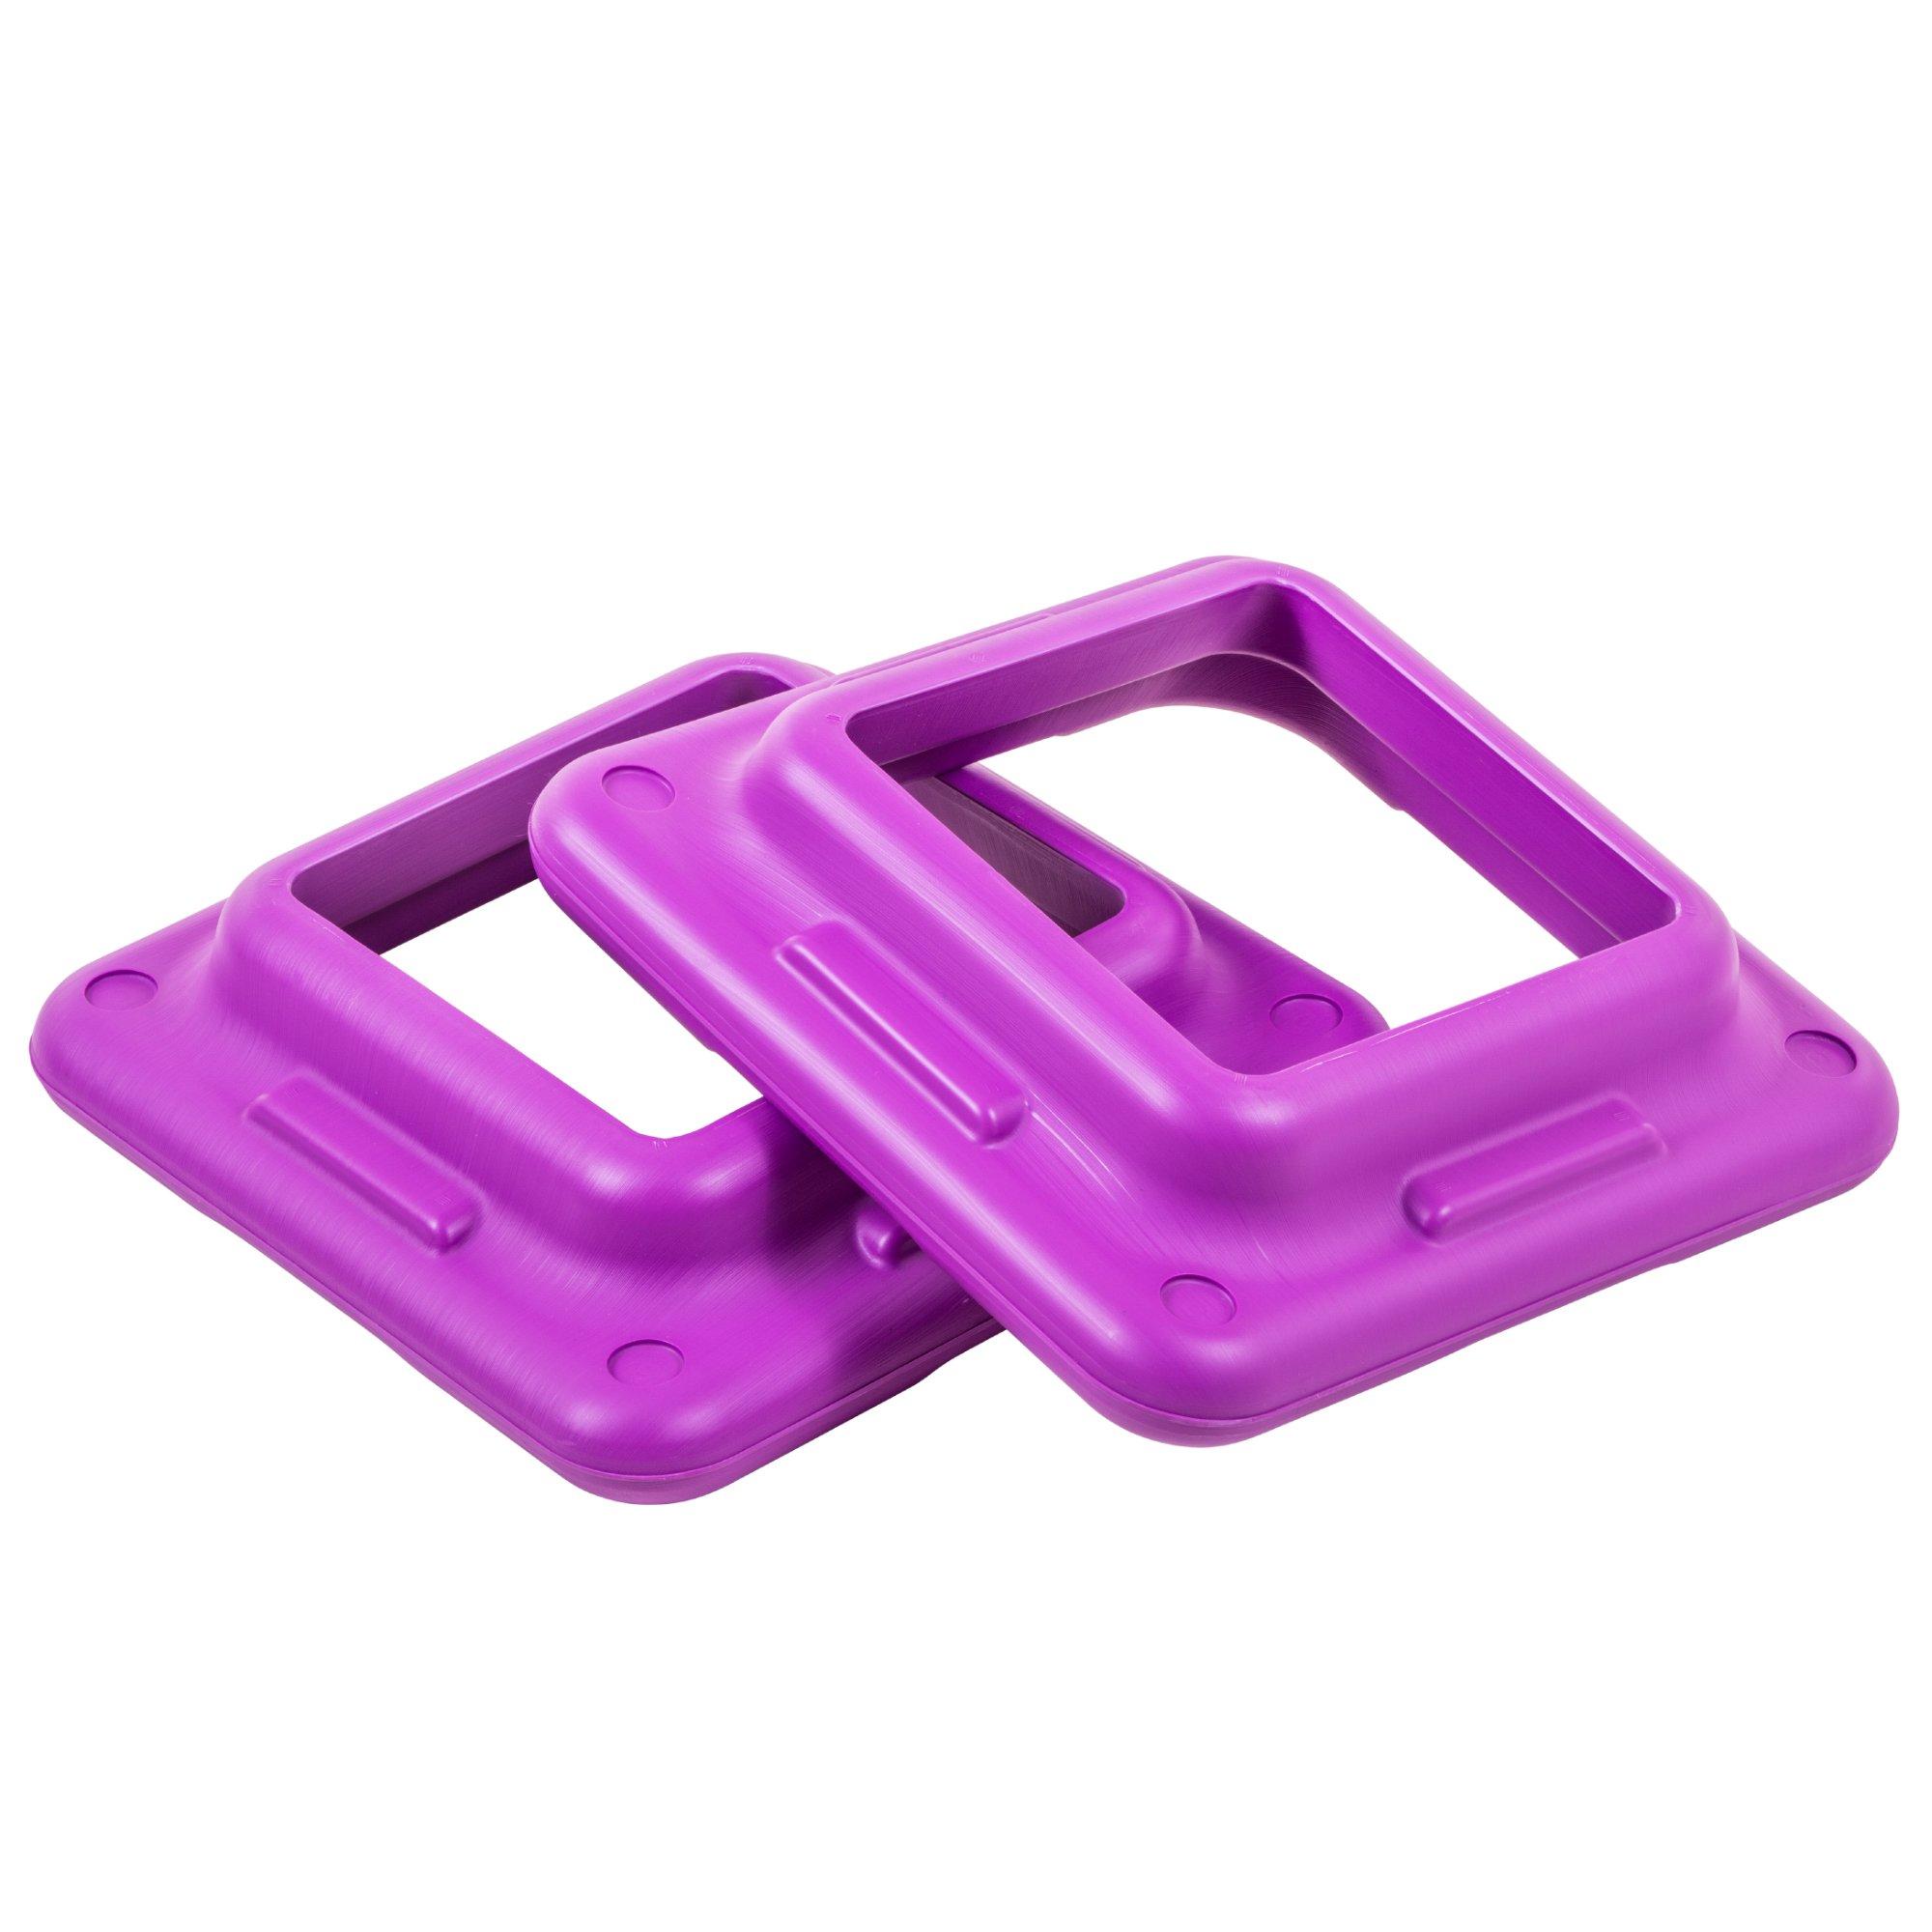 The Step Original Health Club Aerobic Step Riser, Violet, Pair (91123)